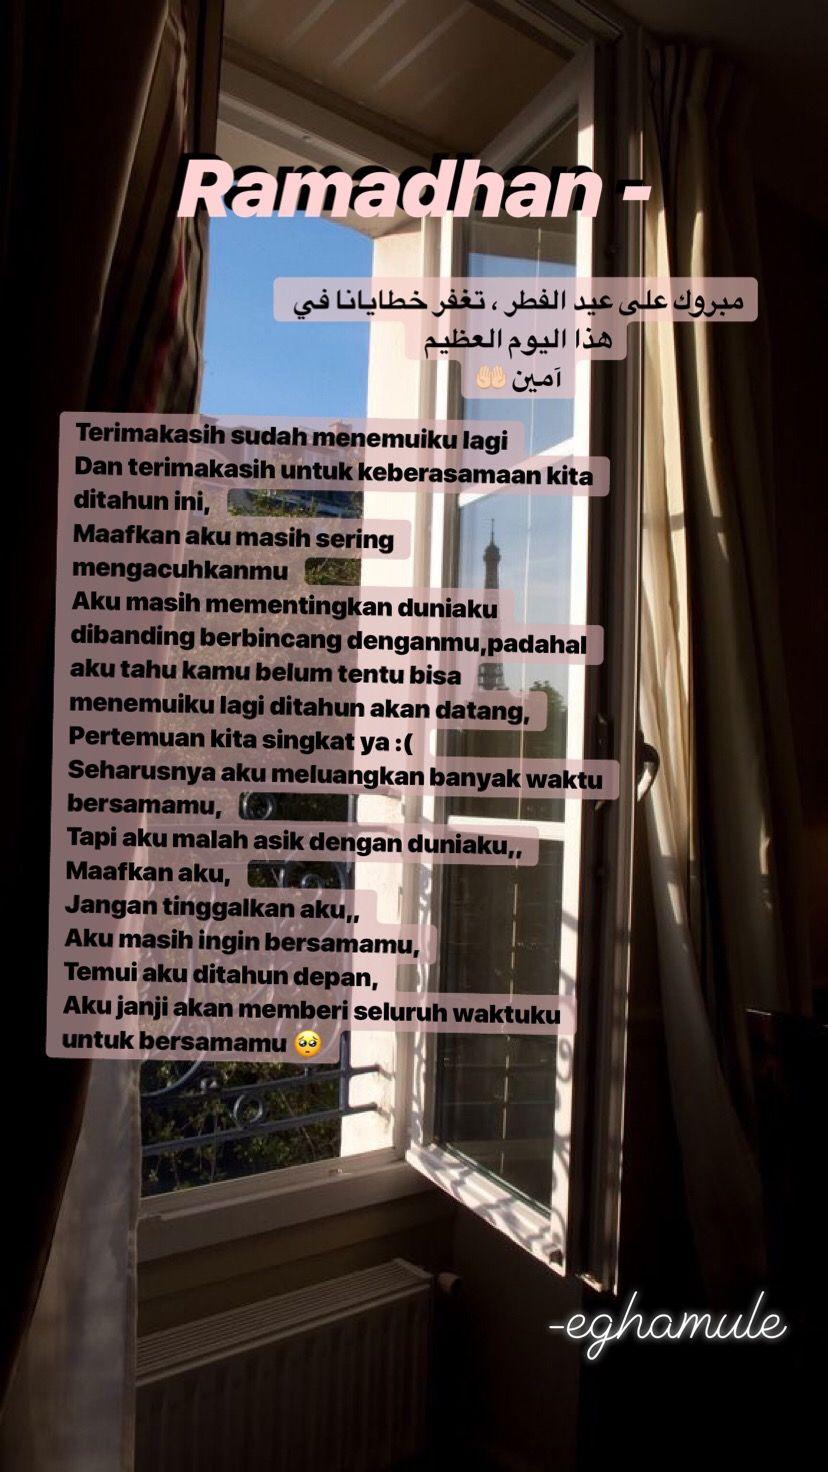 Akhir Dari Ramadhan Motivasi Kutipan Pelajaran Hidup Kutipan Buku